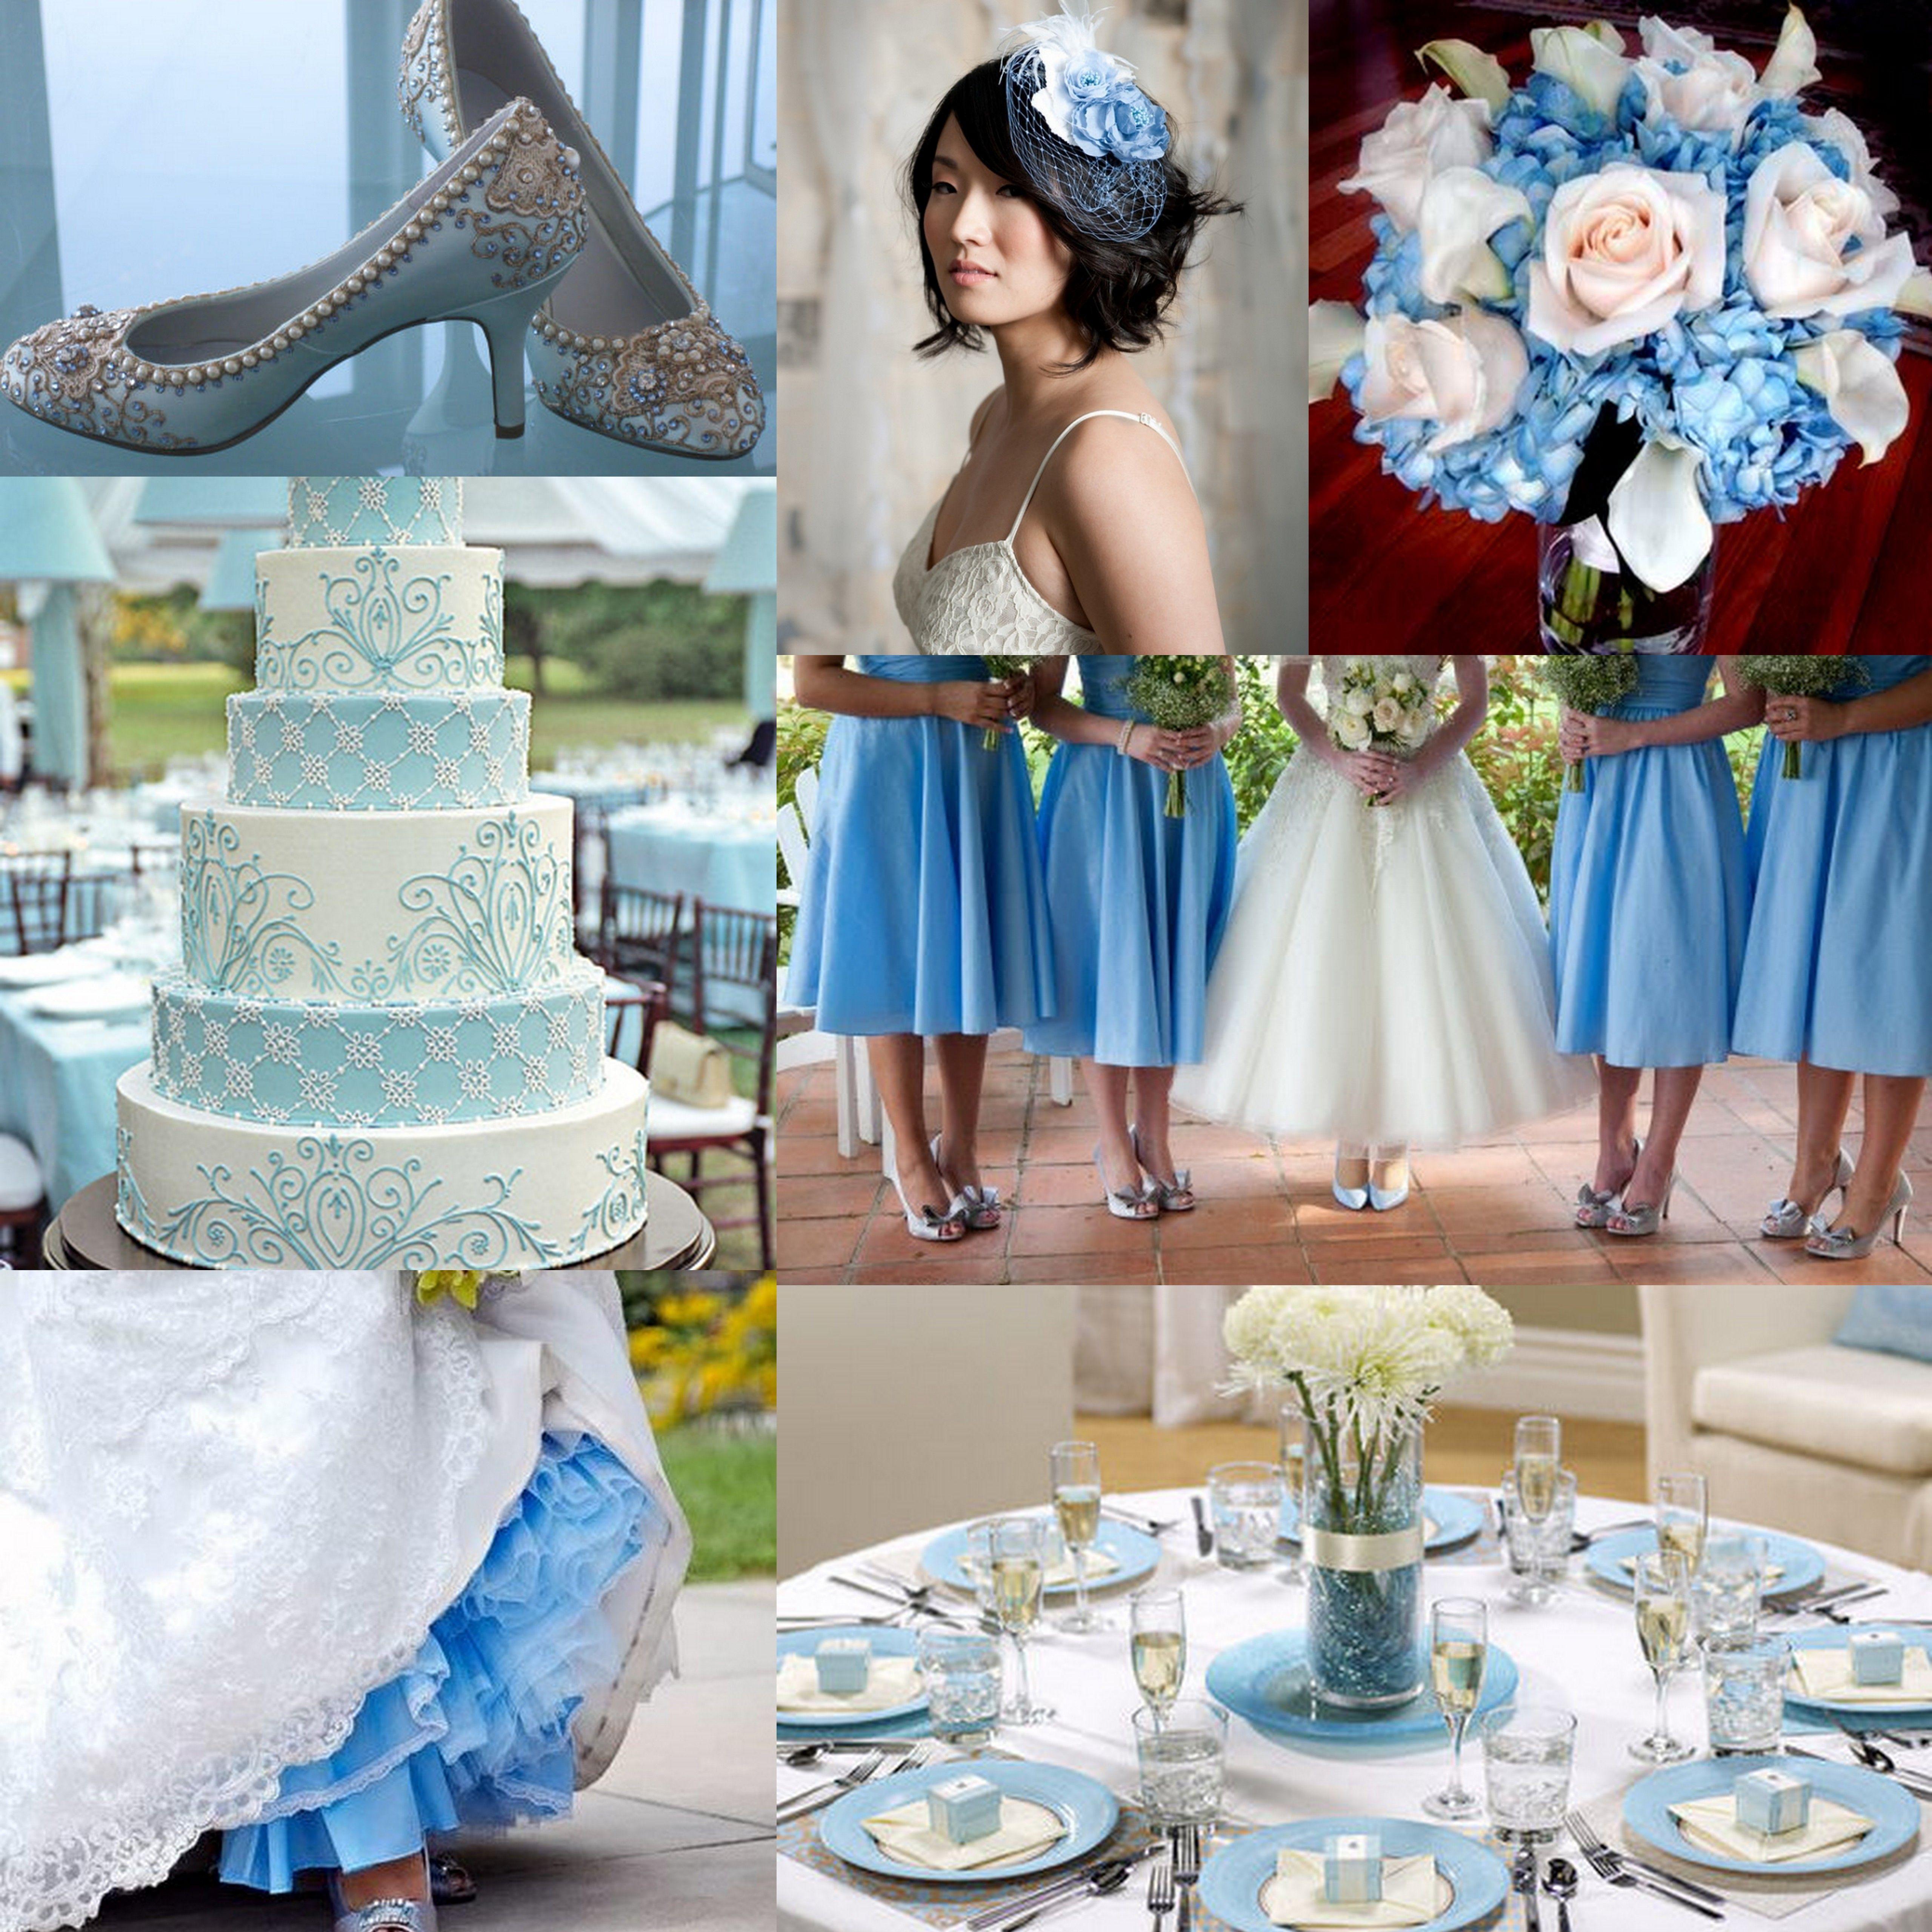 Httpbridesmaidsandweddingswp contentuploads201206 wedding junglespirit Images